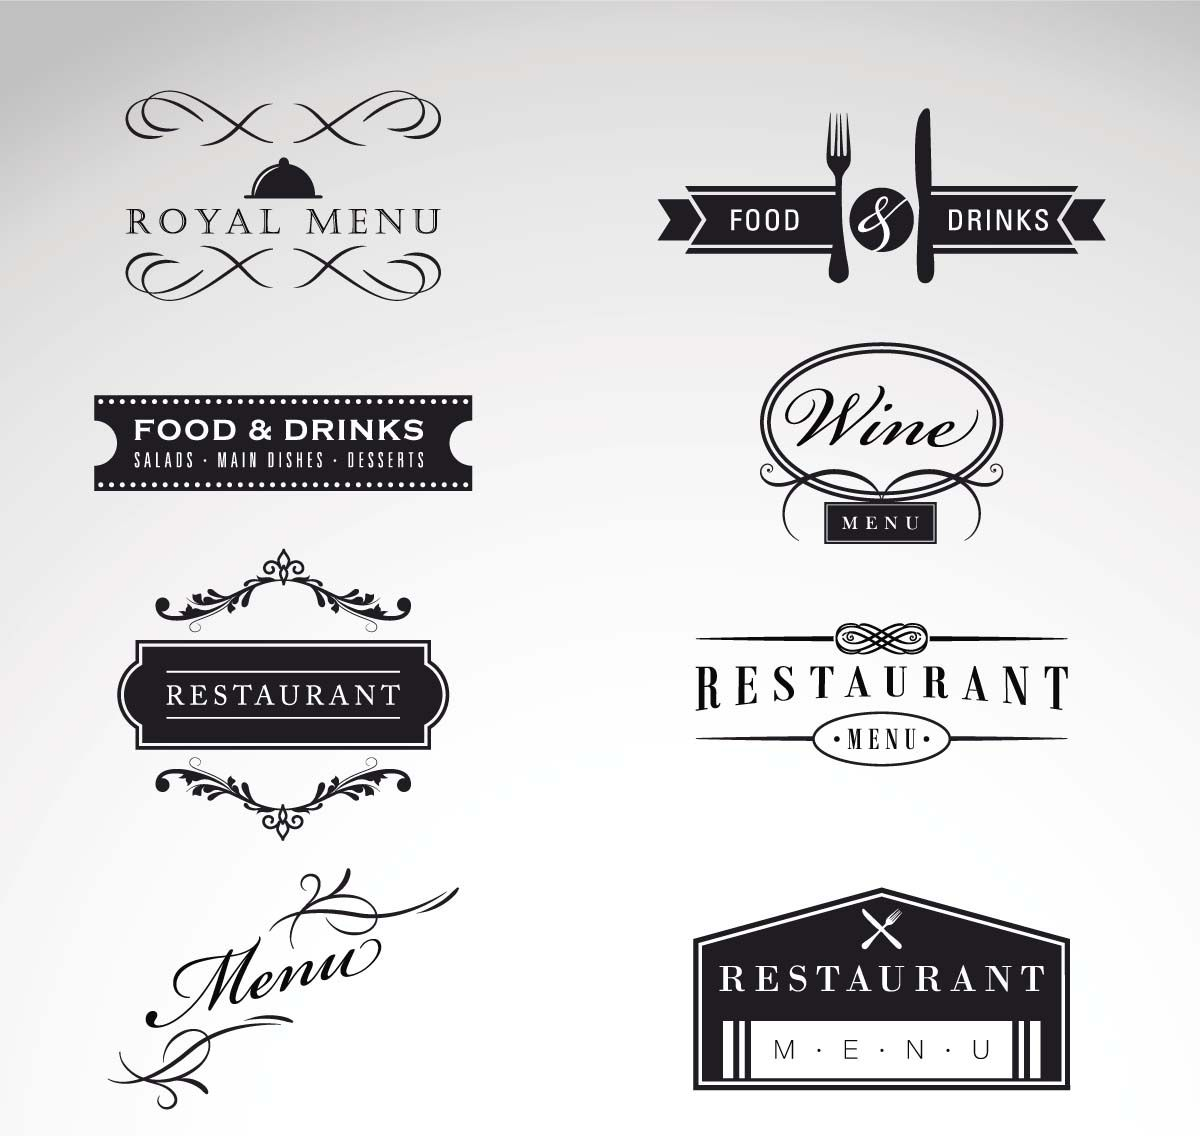 Vintage logo restaurant menu vector set | Retro cafe, Logos and ...